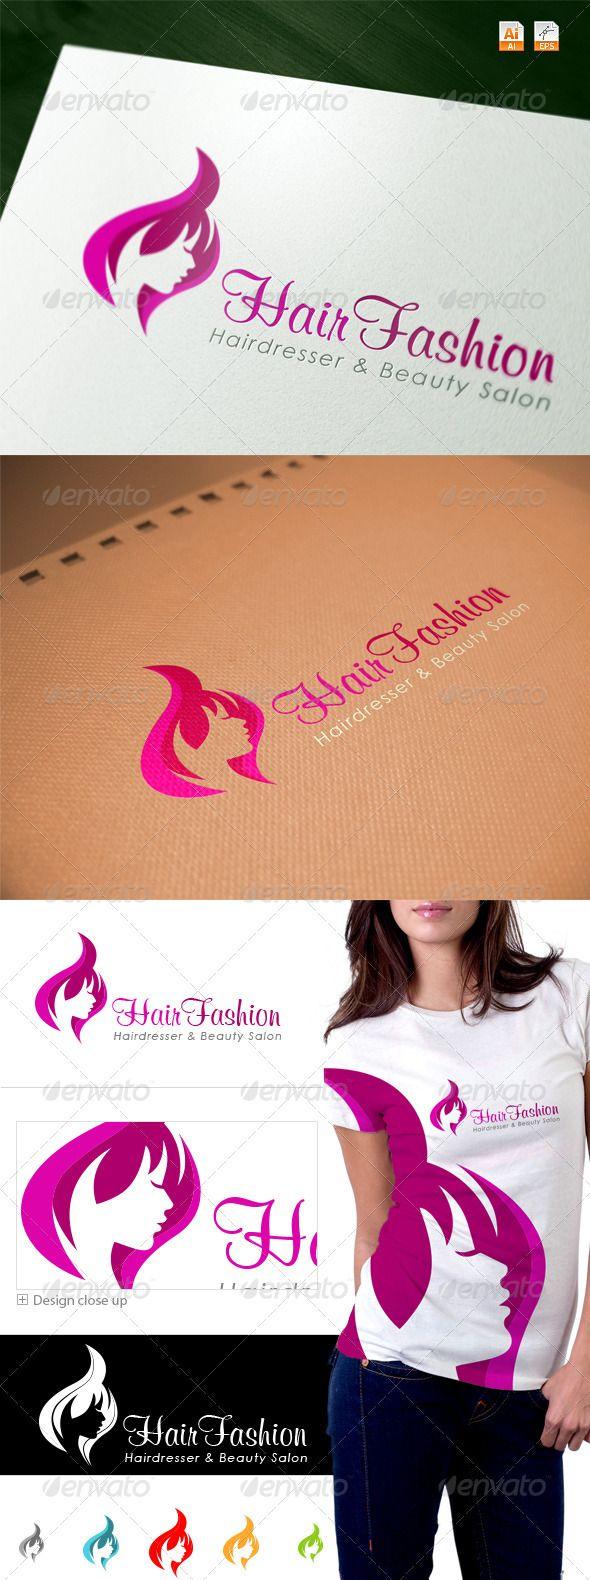 Hair Fashion - Spa & Salon Logo